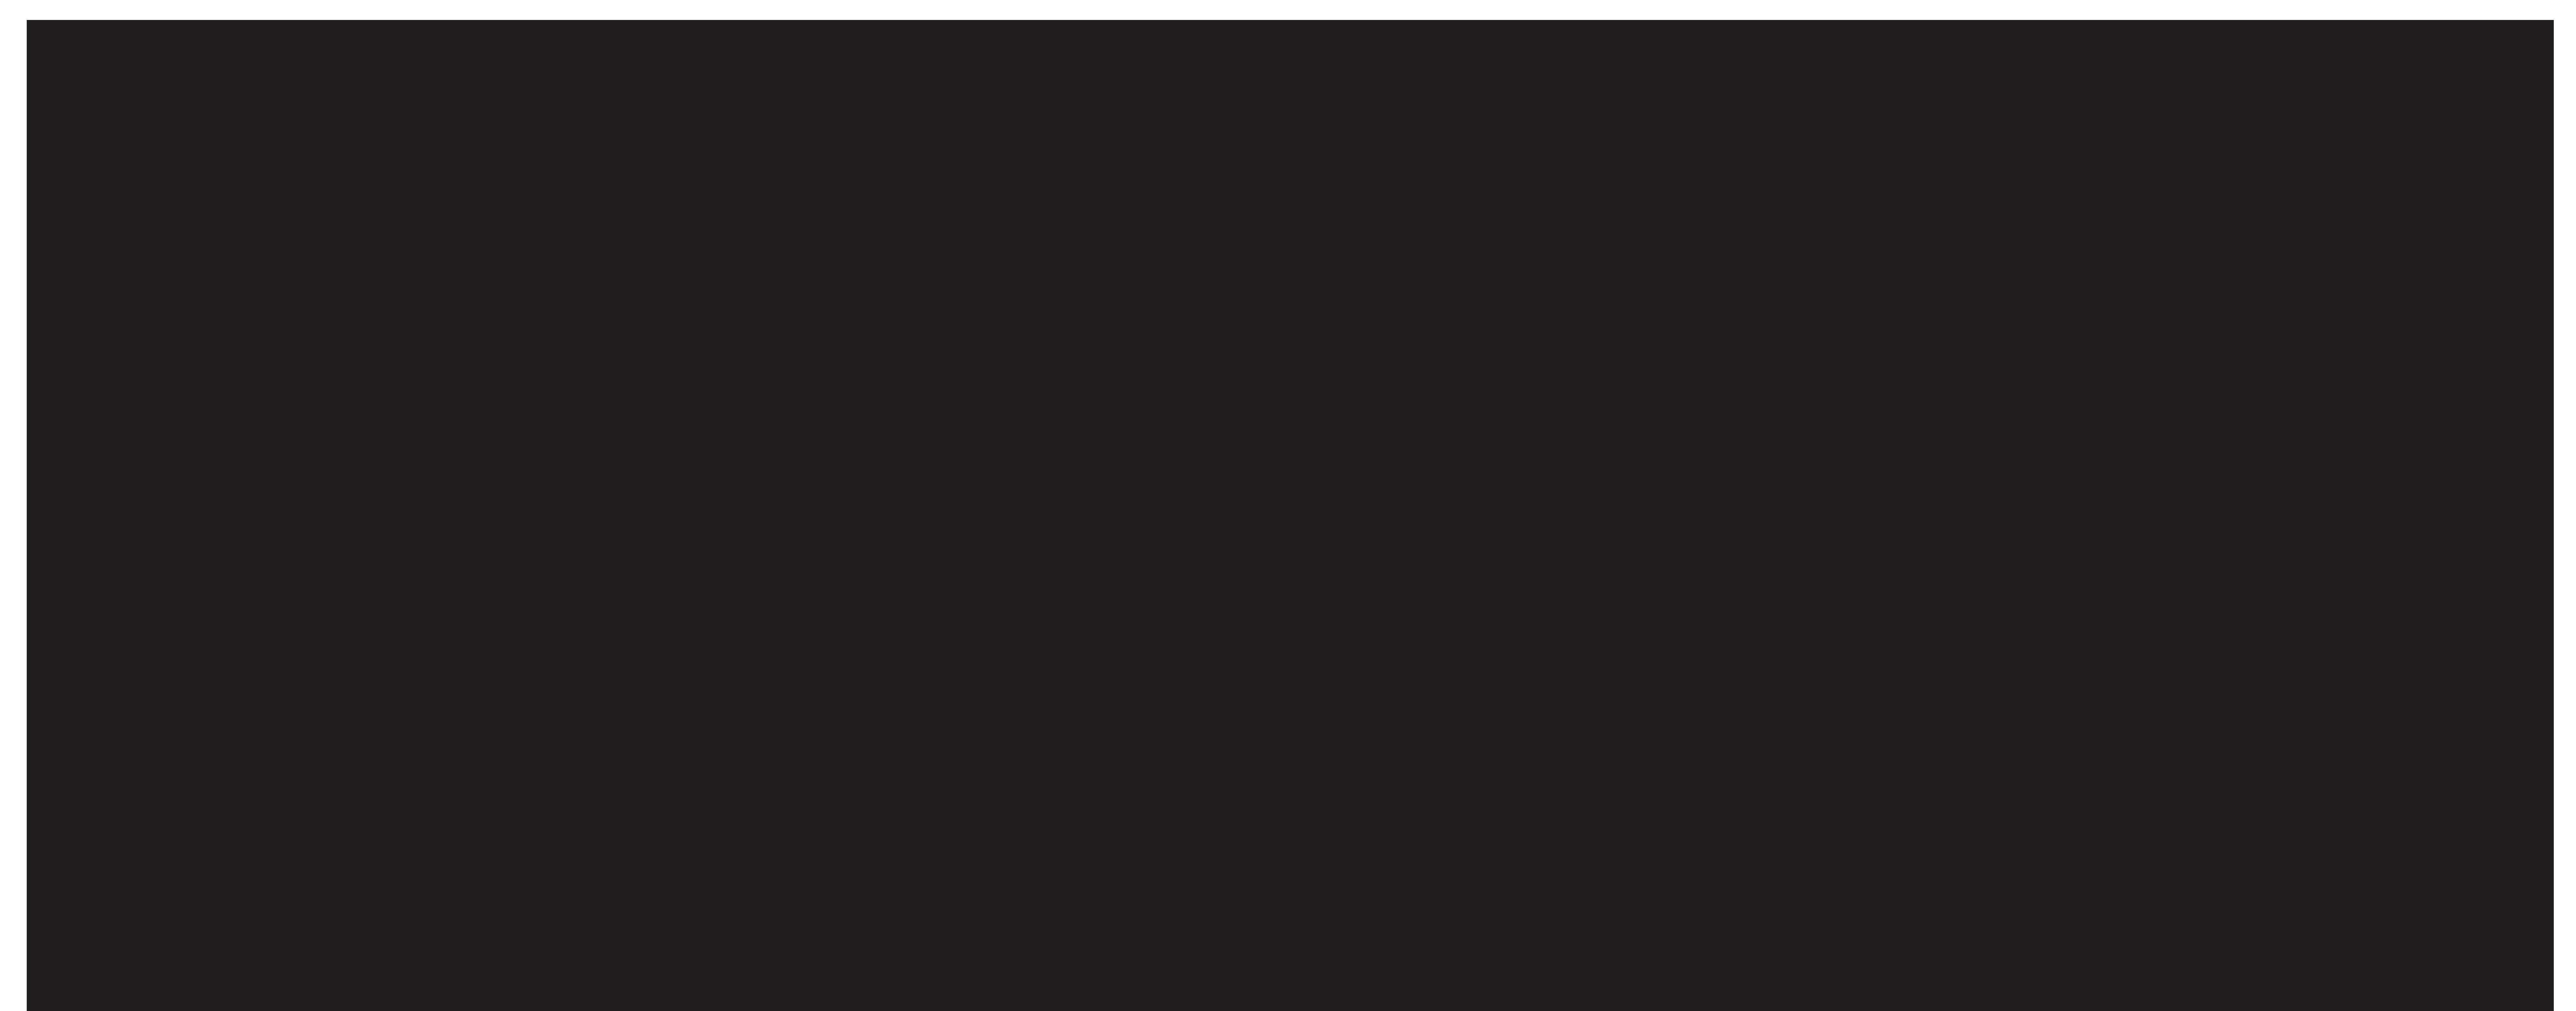 Palm island png clip. Watermelon clipart silhouette